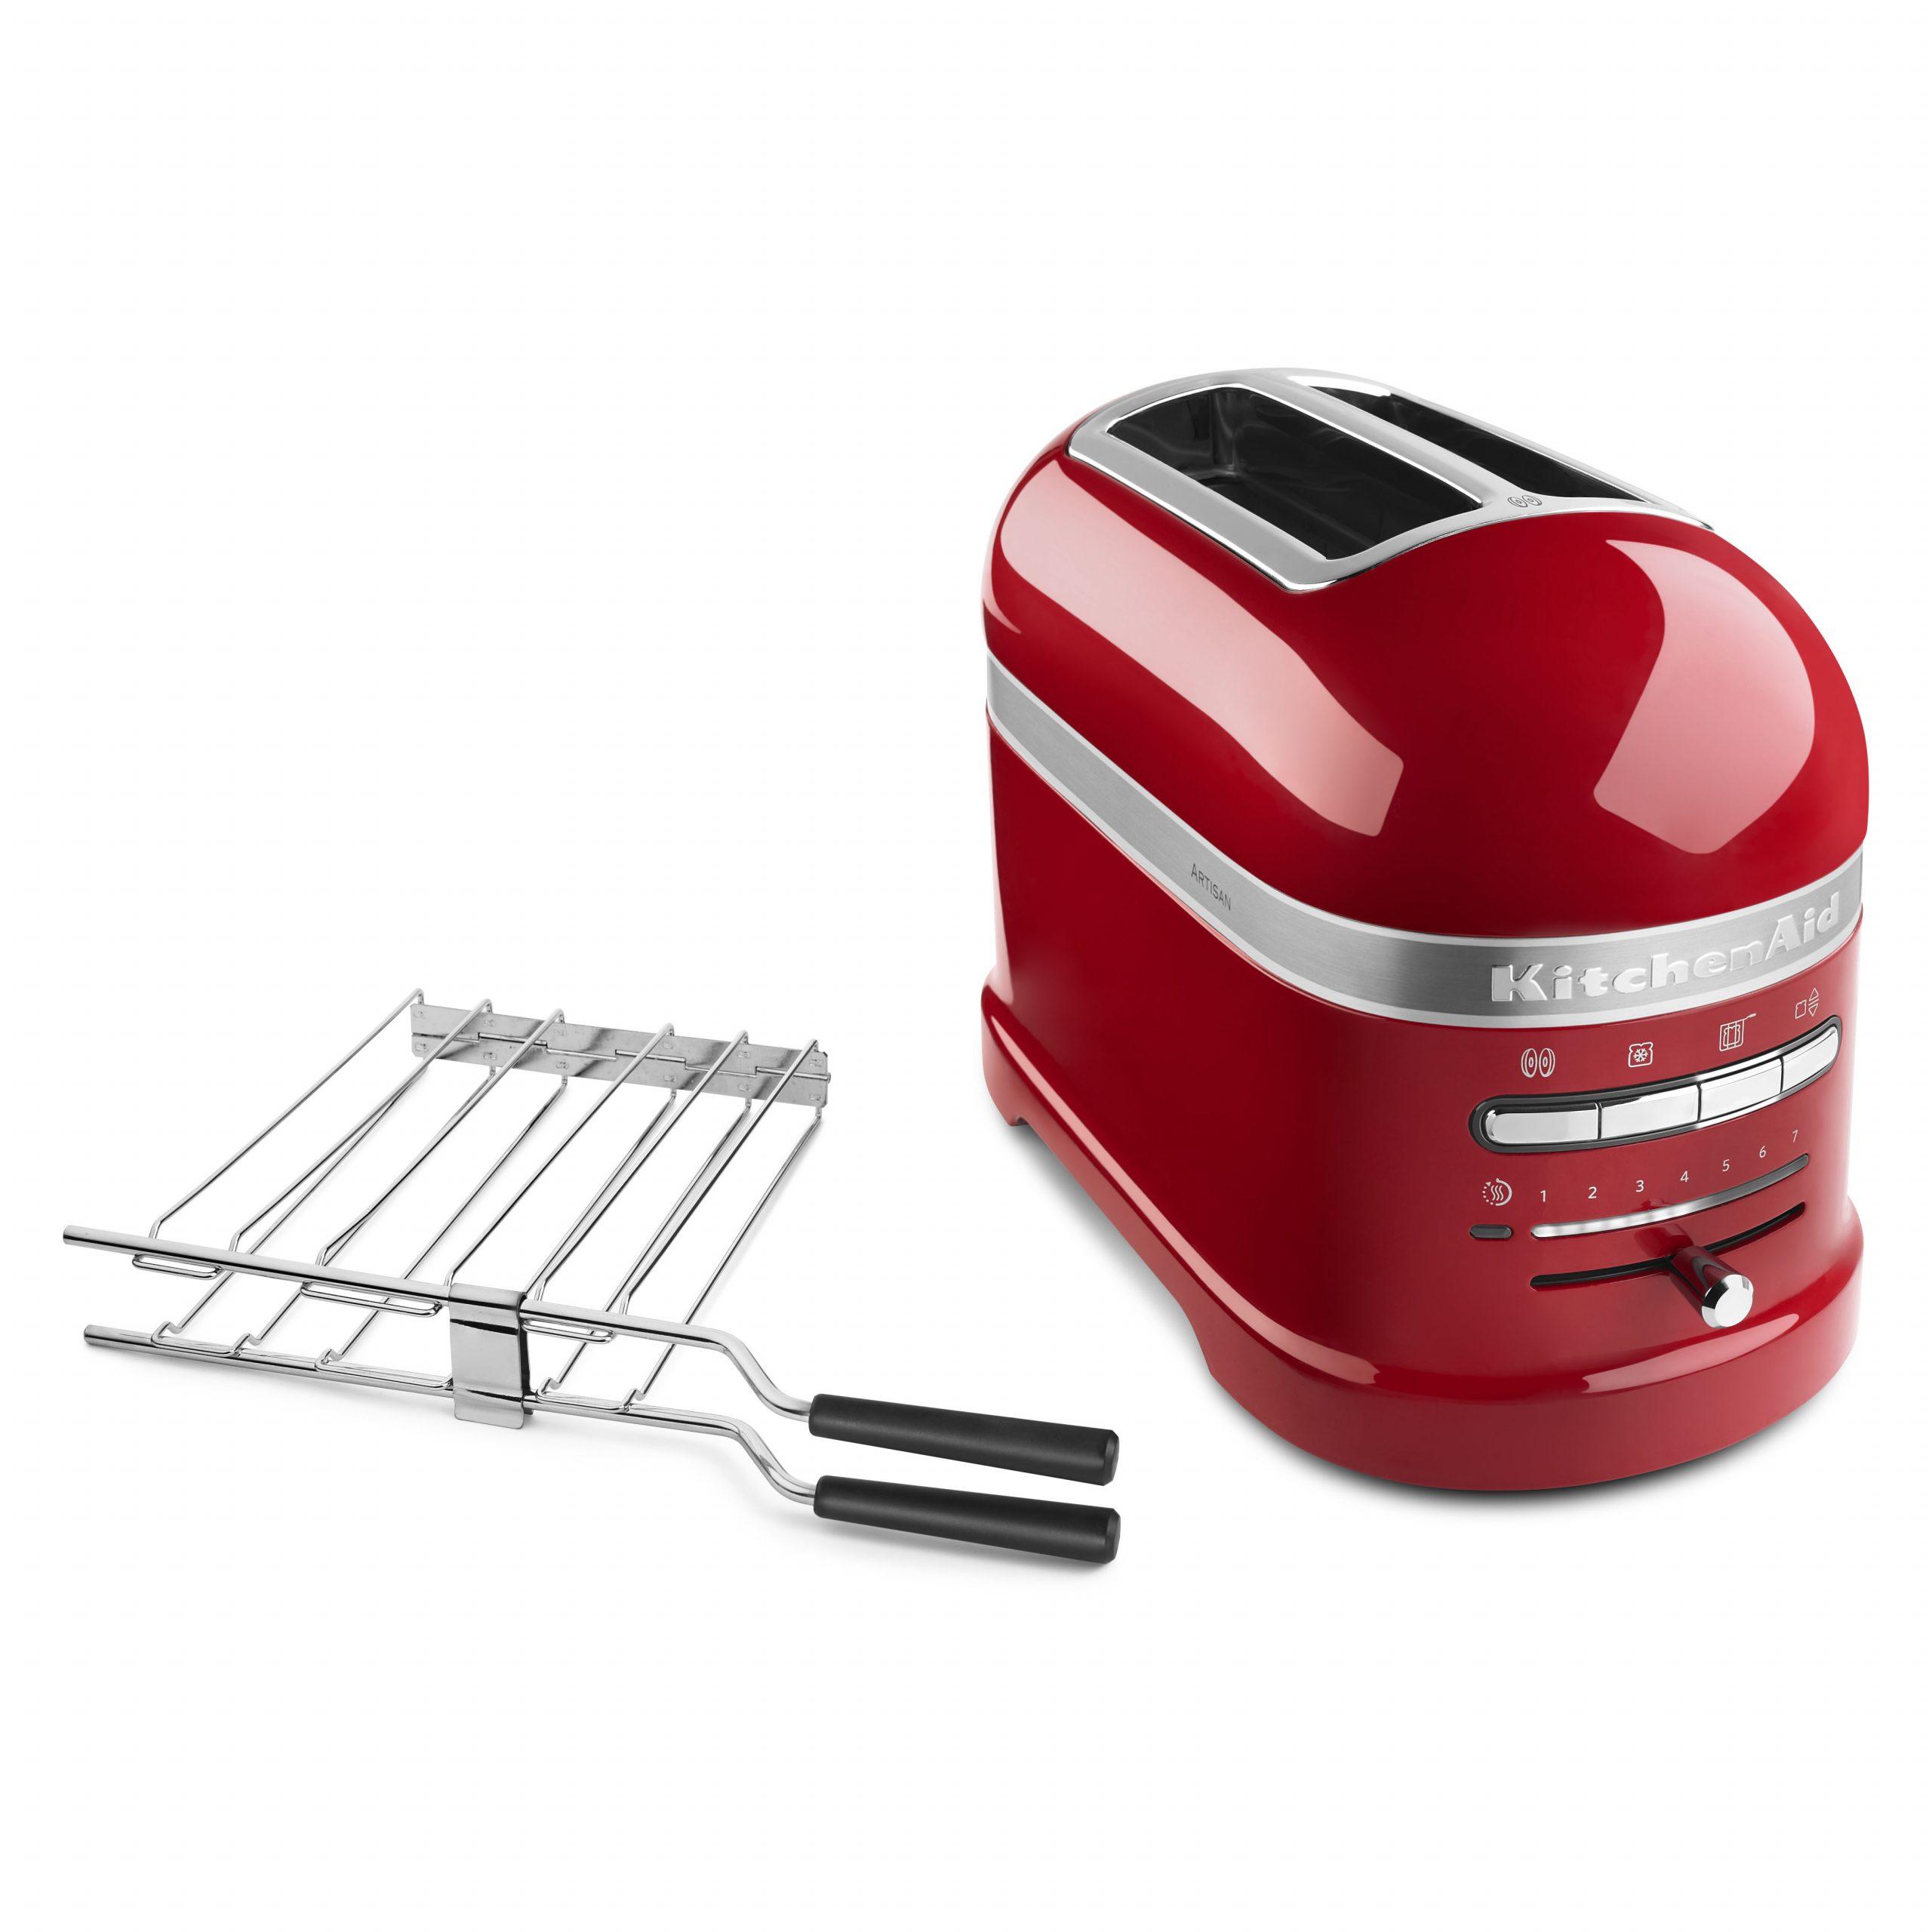 Kitchenaid Pro Line 2 Slice Automatic Toaster Kmt2204